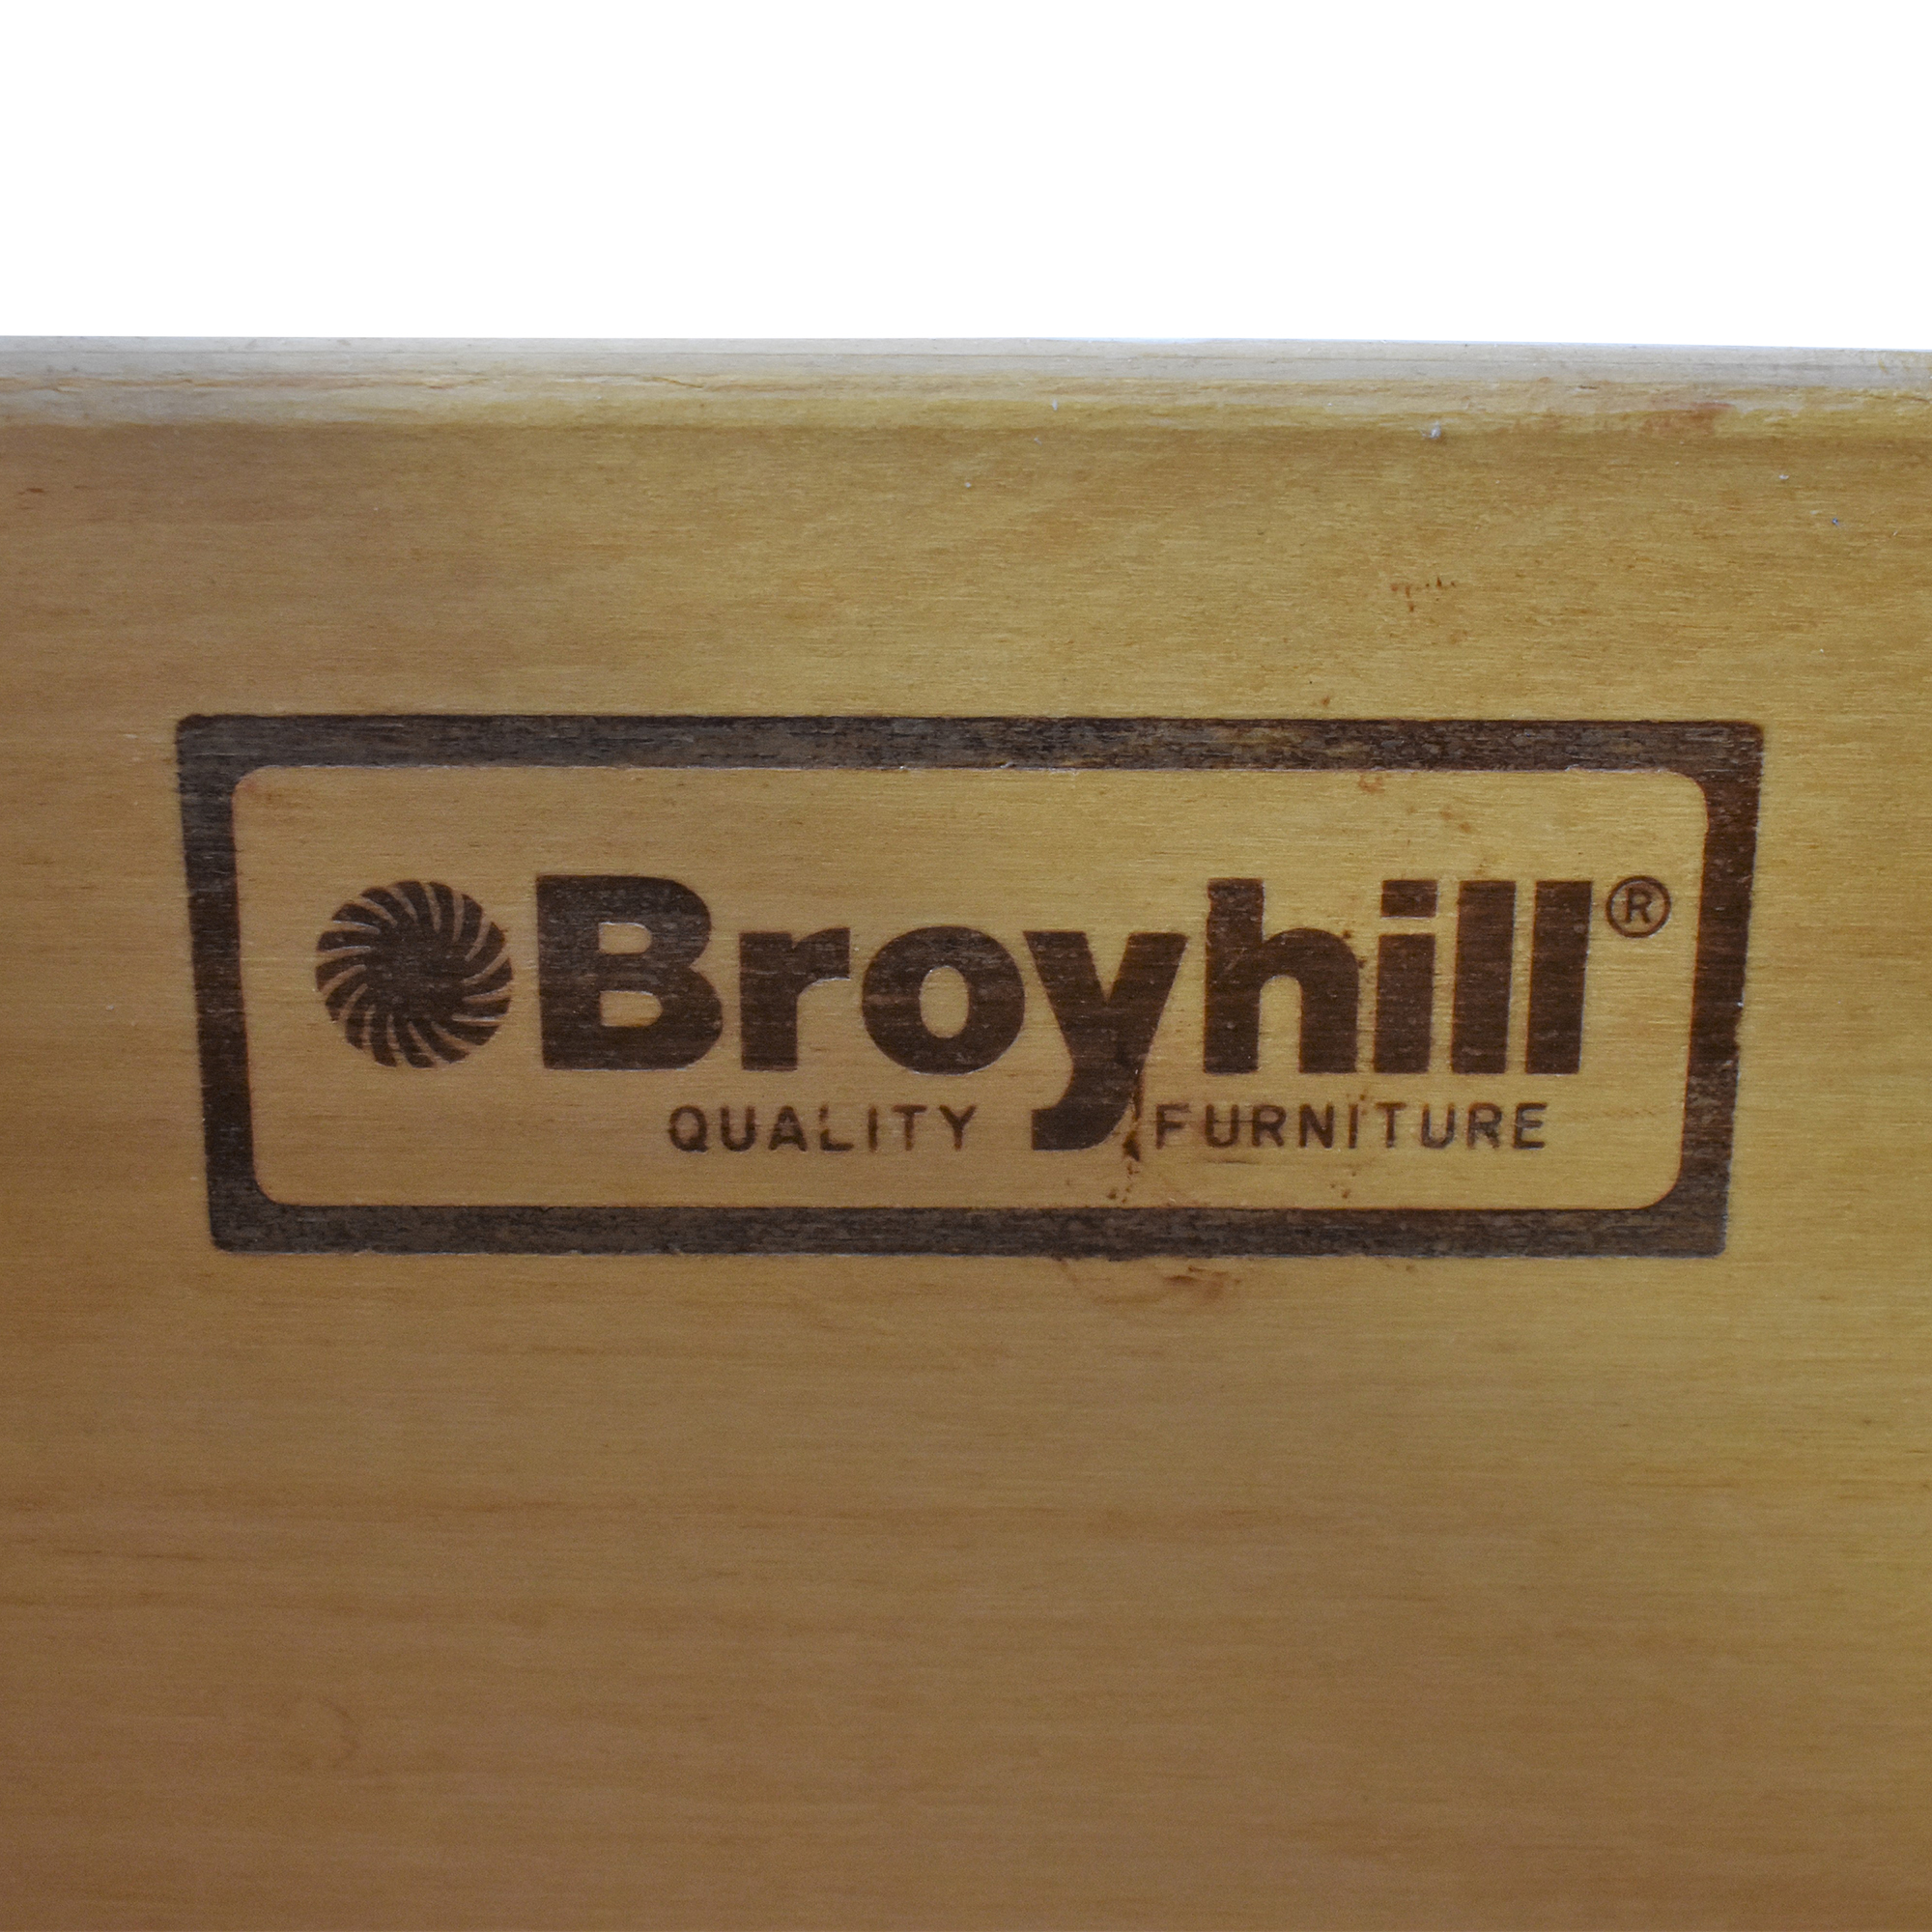 Broyhill Furniture Broyhill Door Dresser with Mirror price